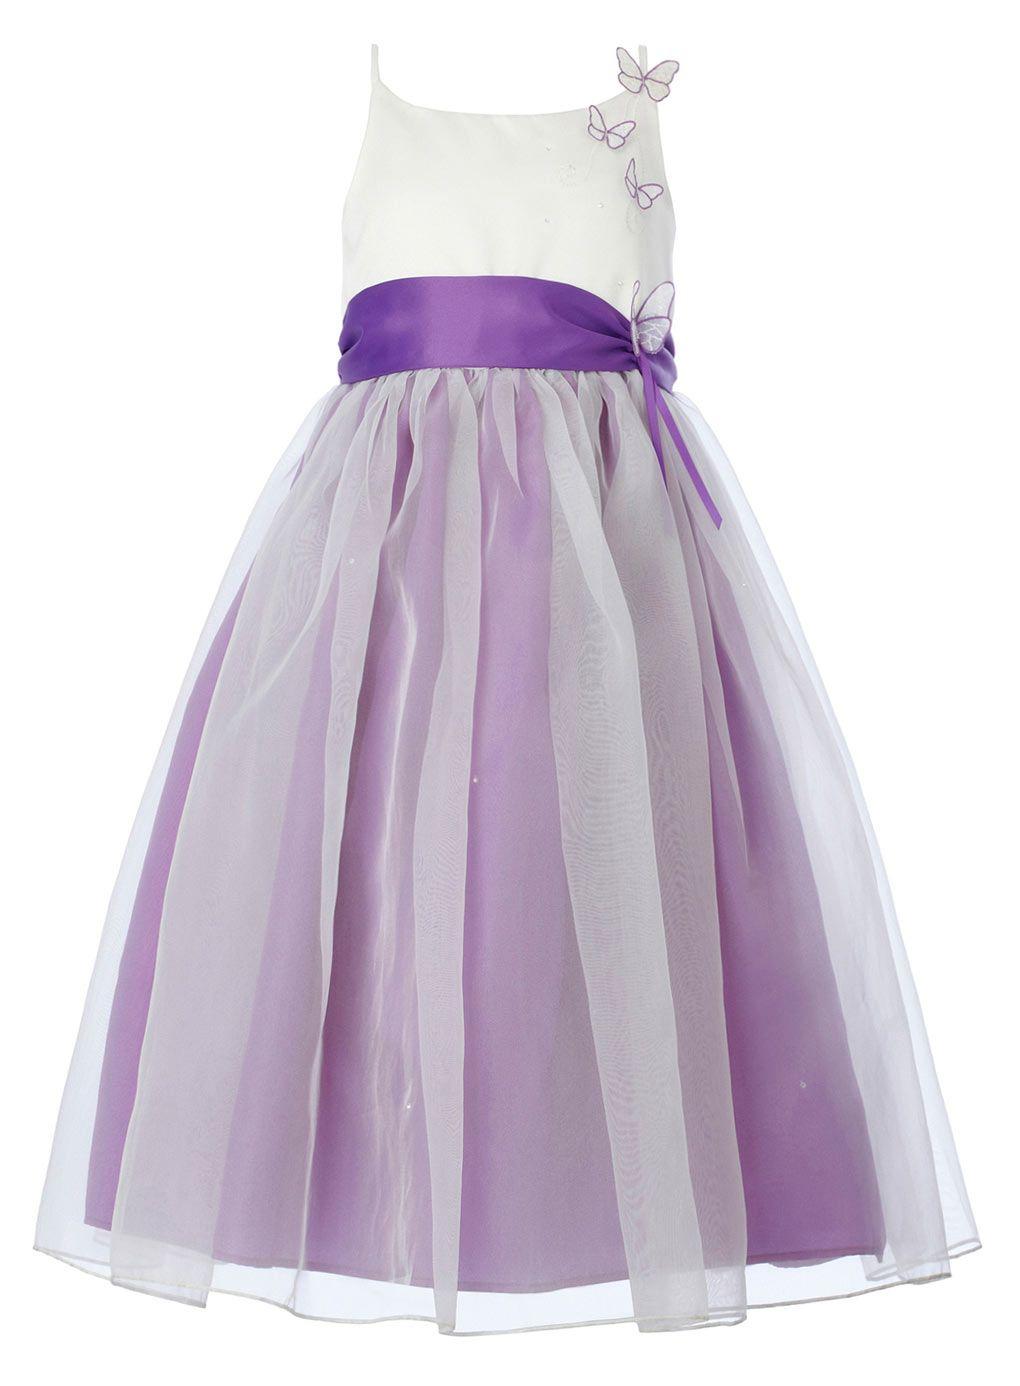 Lela butterfly purple bridesmaid dress child dresses young lela butterfly purple bridesmaid dress child dresses young bridesmaids ombrellifo Gallery